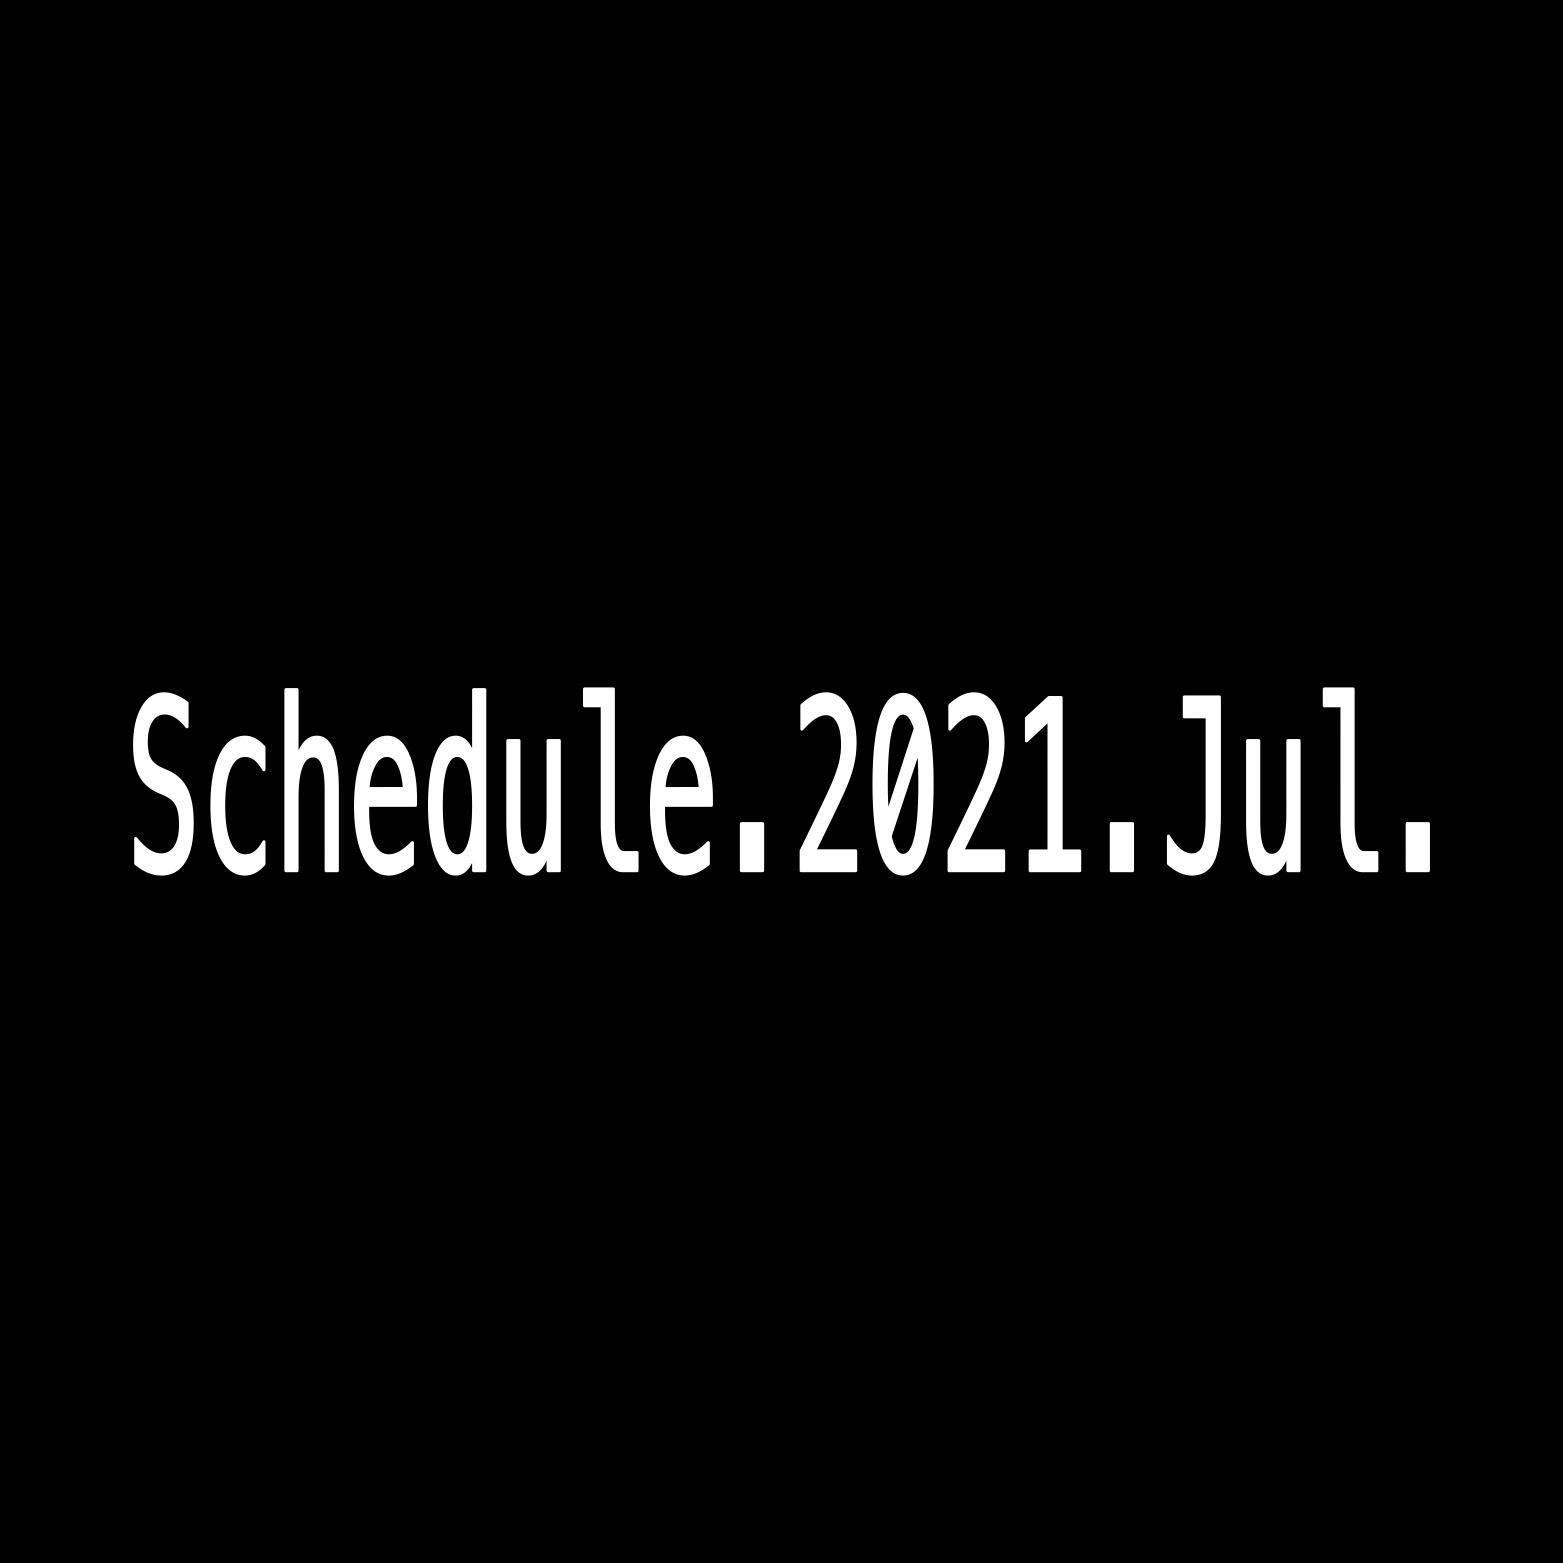 2021年7月Schedule